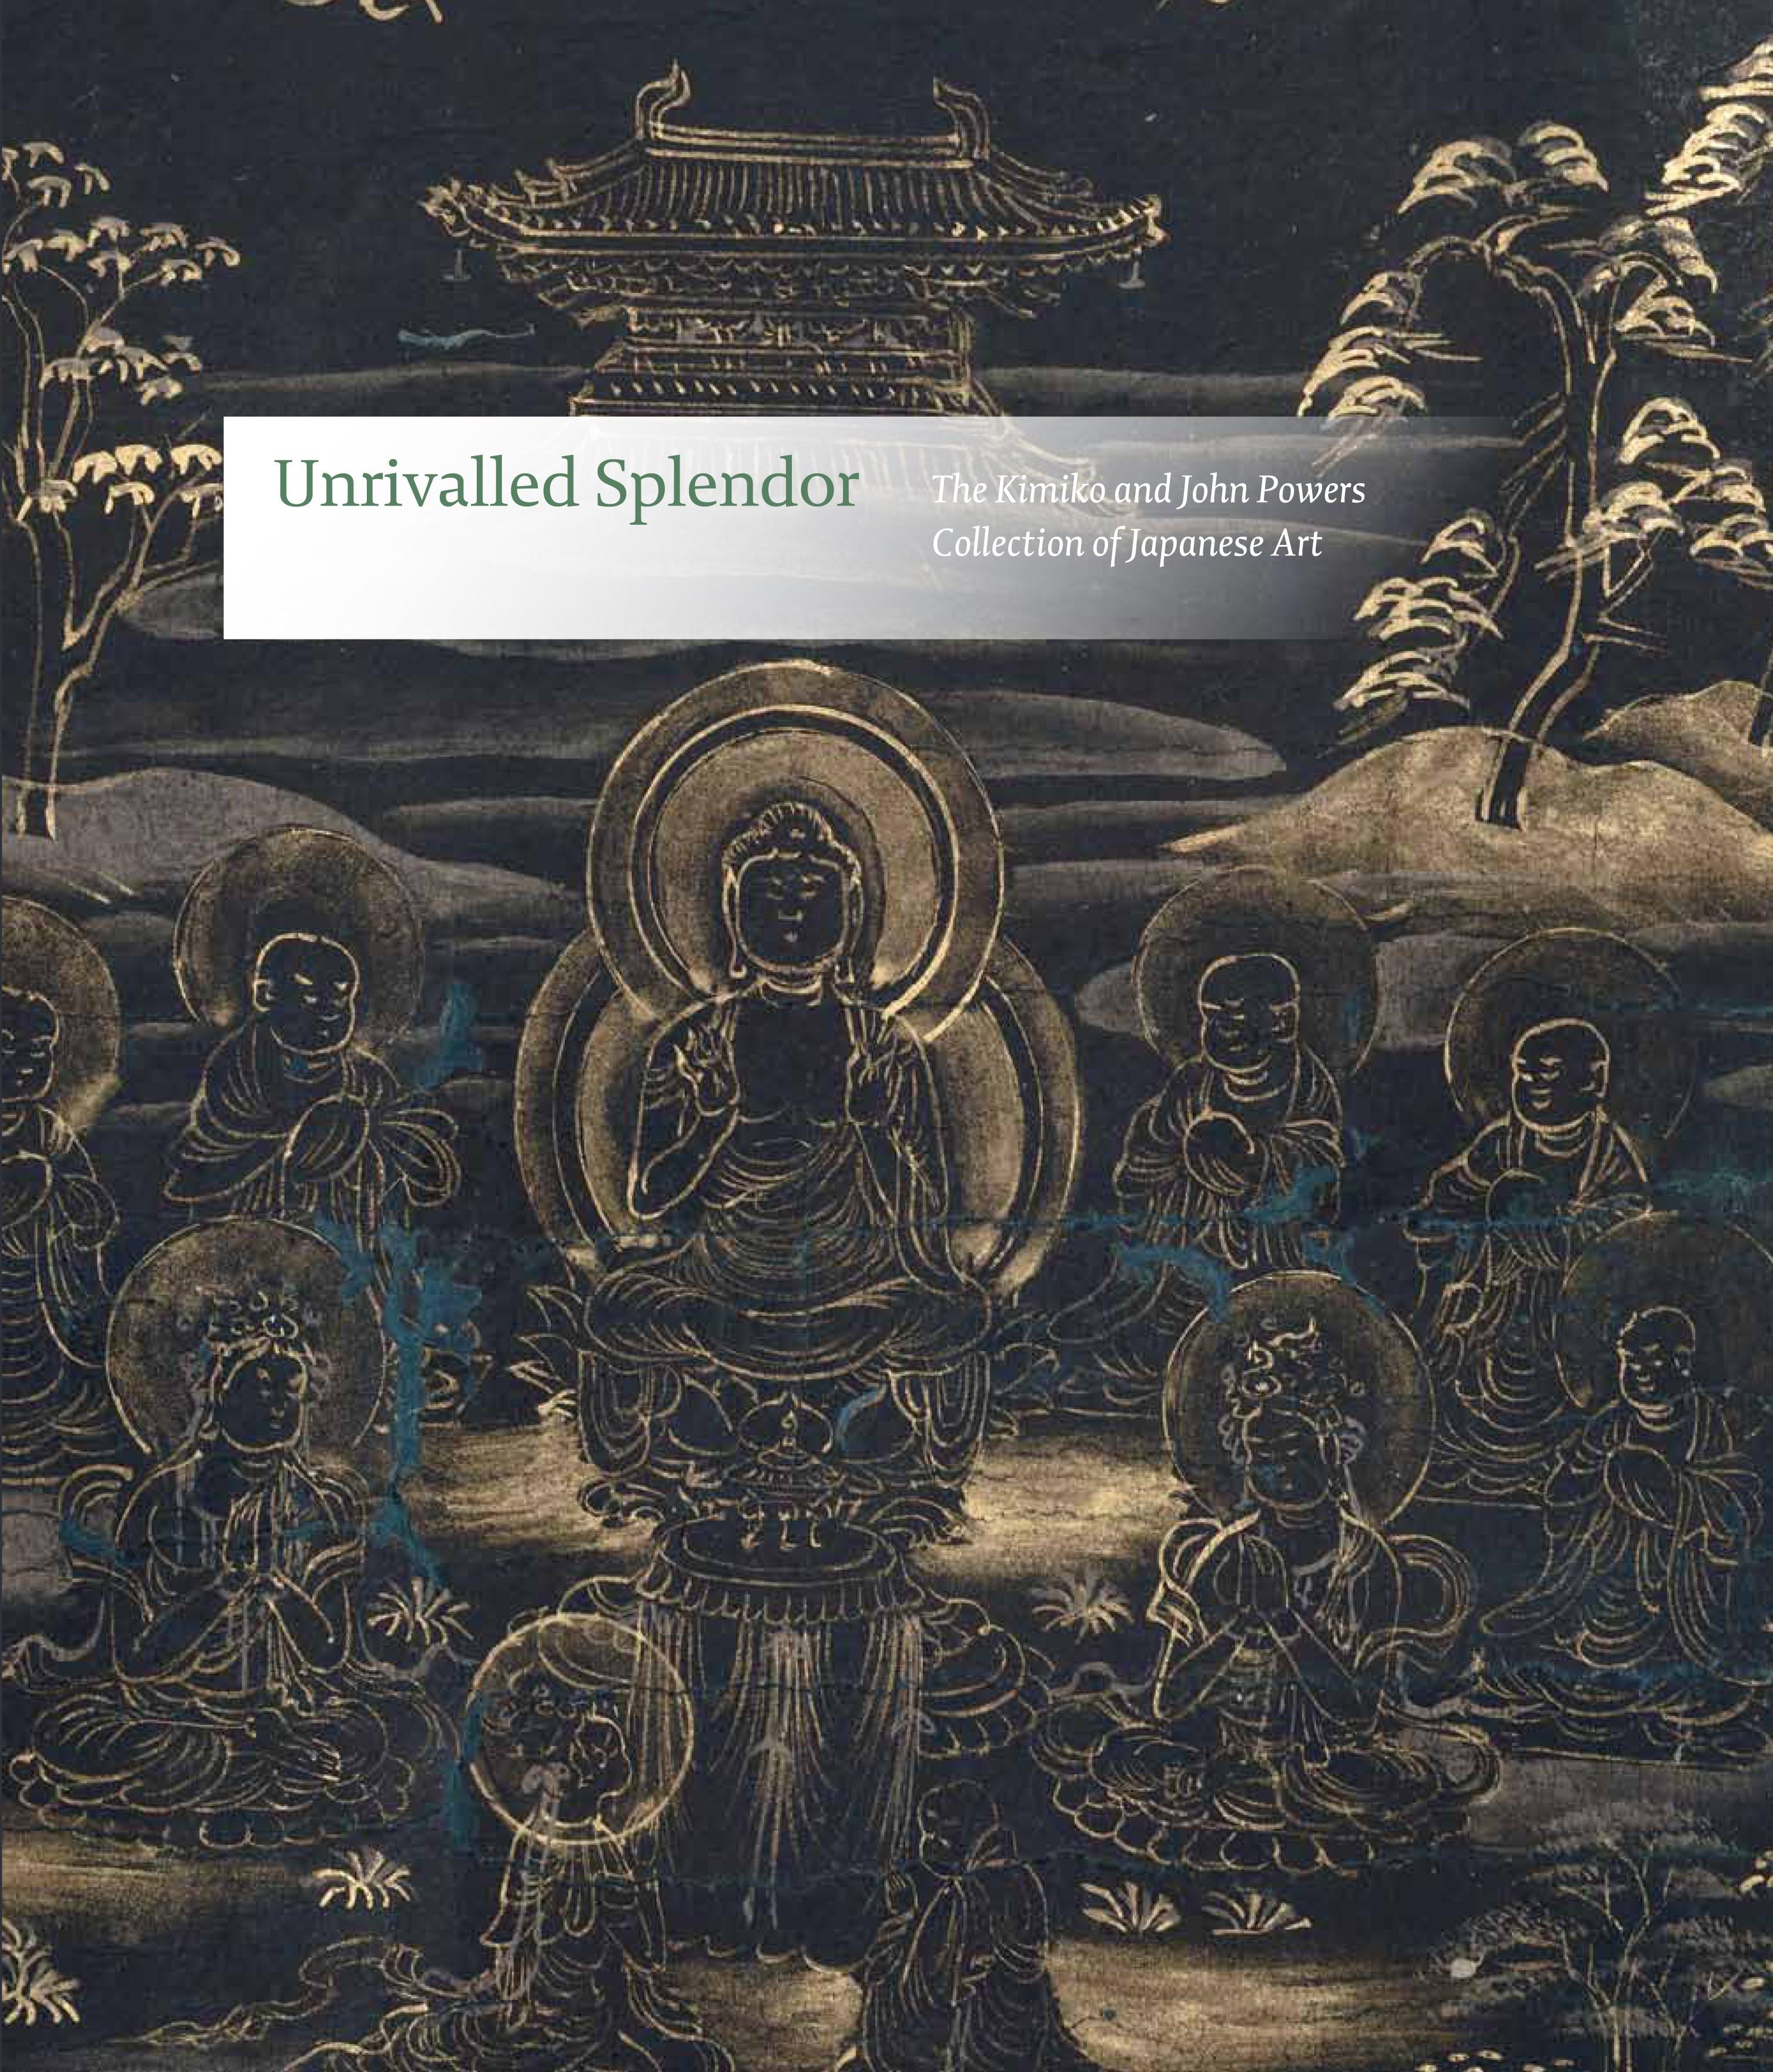 UnrivalledSplendors_bookcover